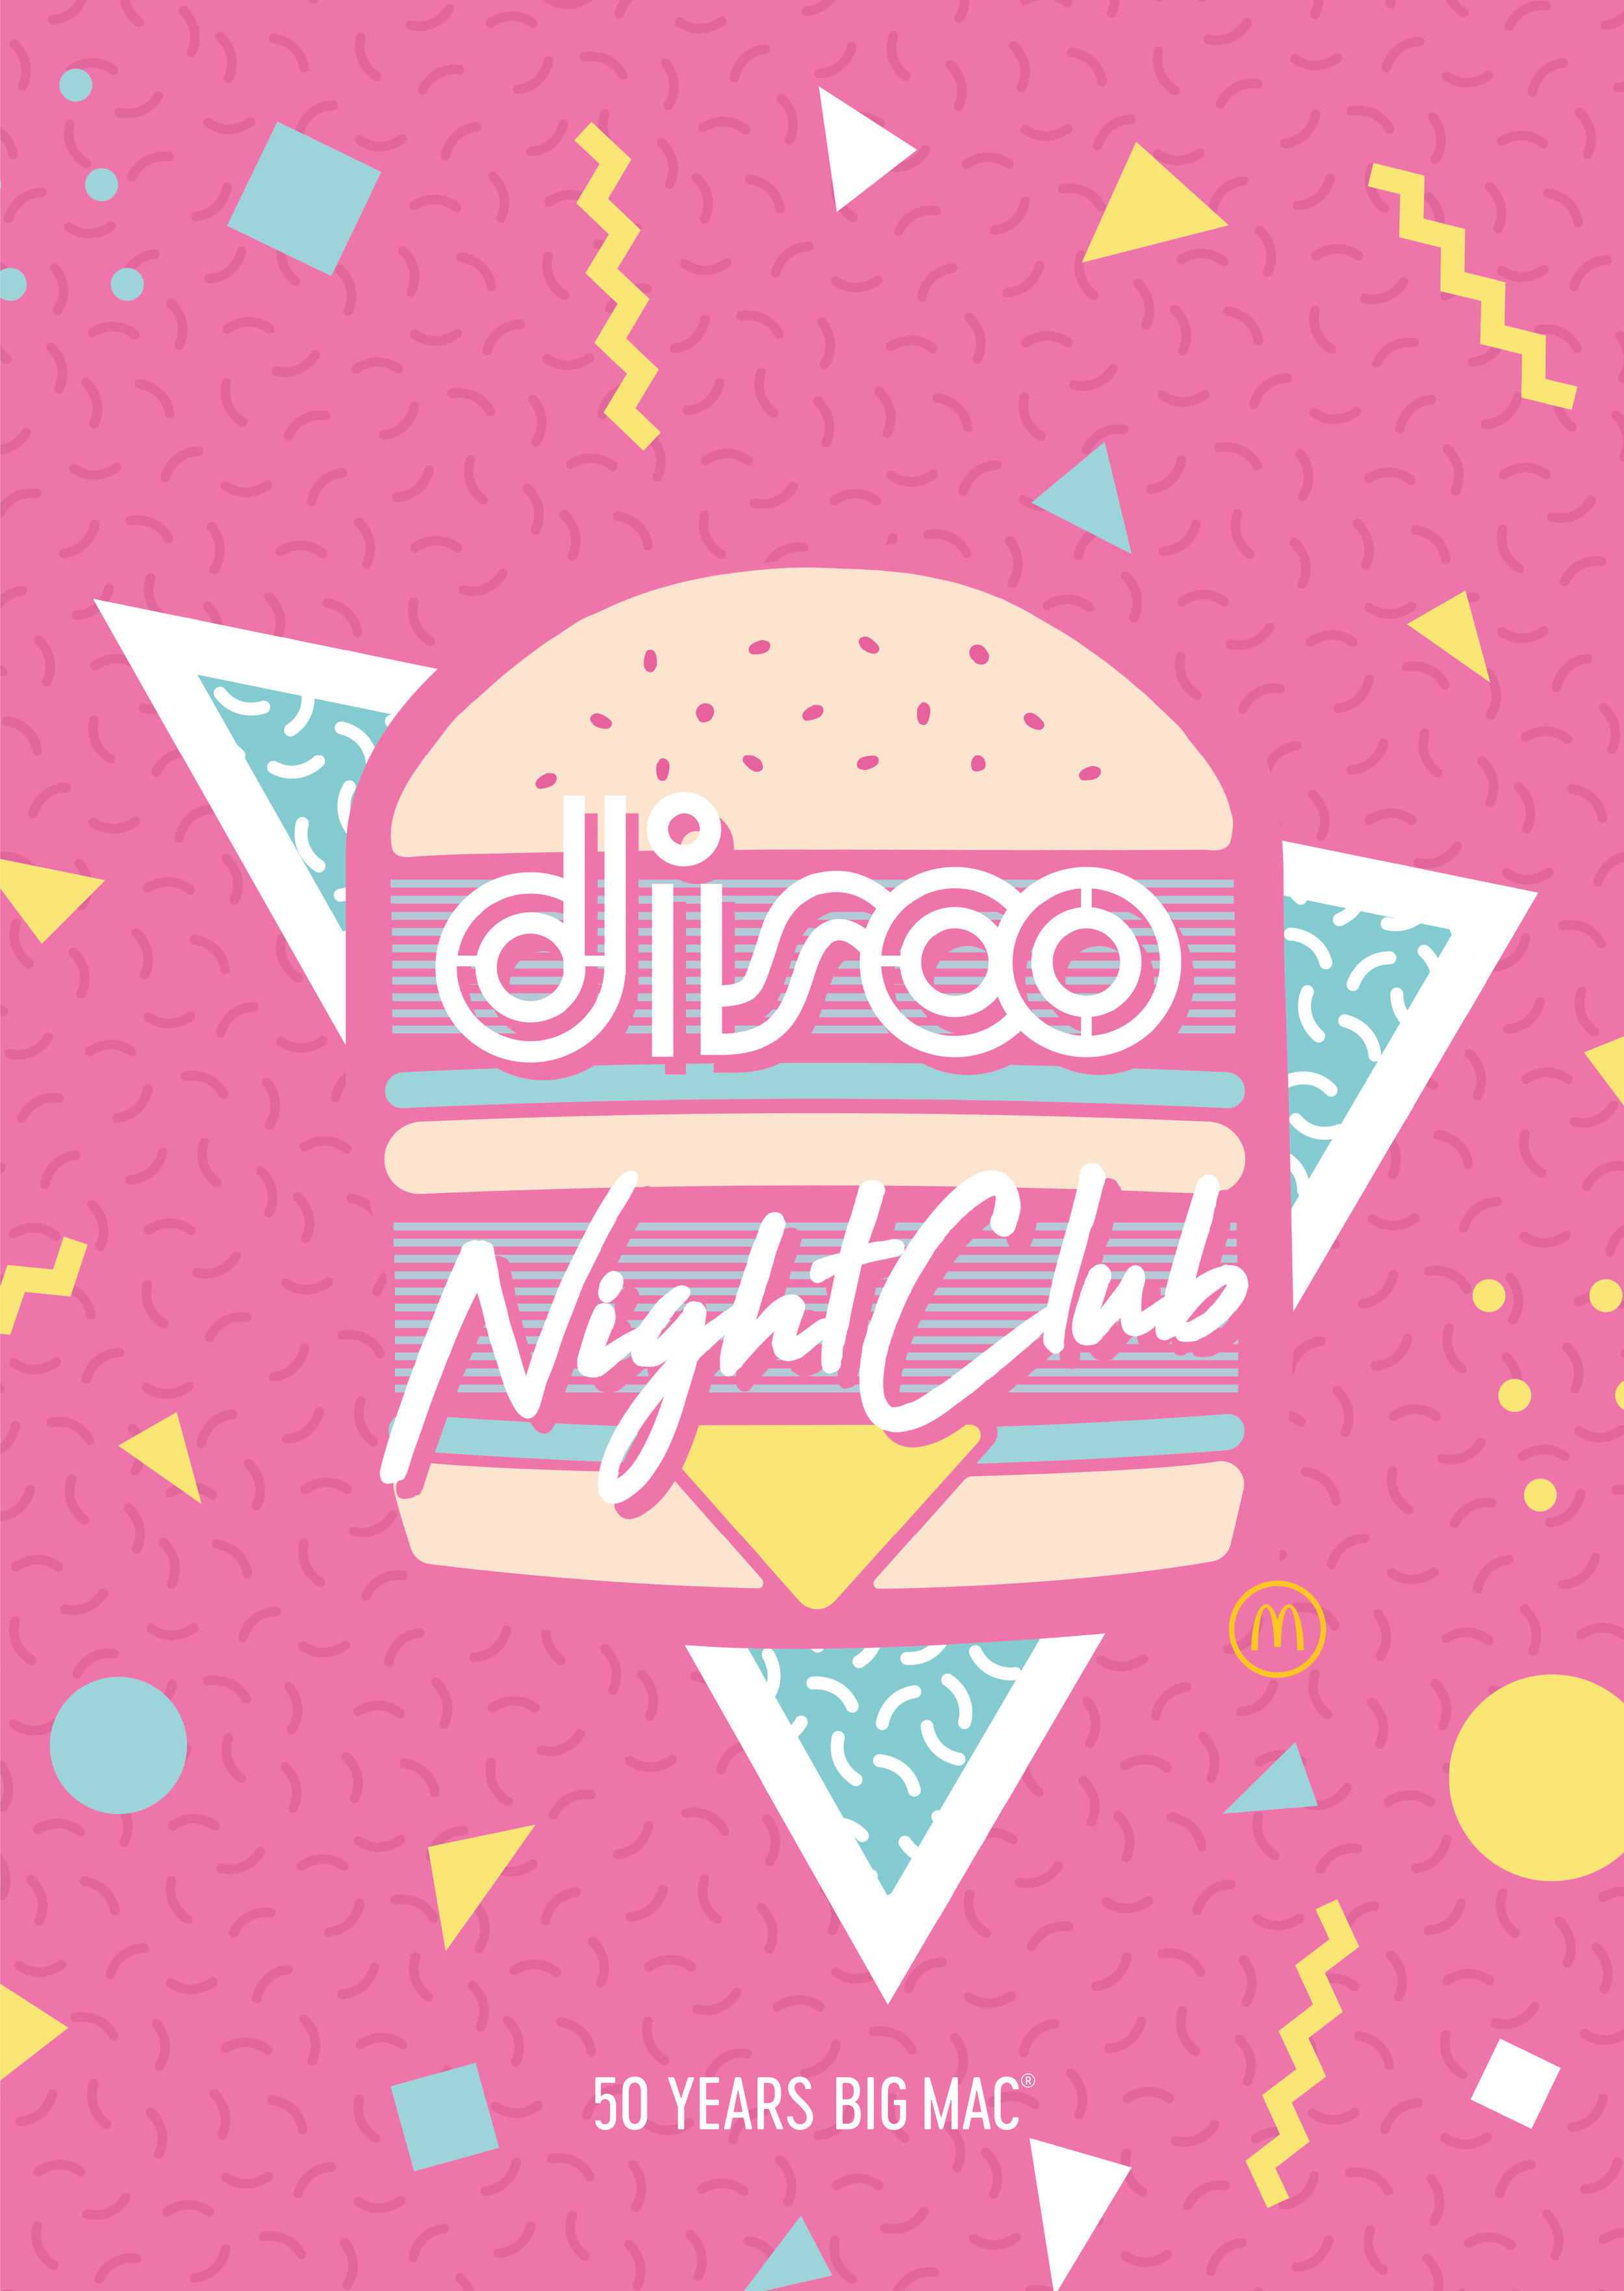 9_Disco:Club.jpg